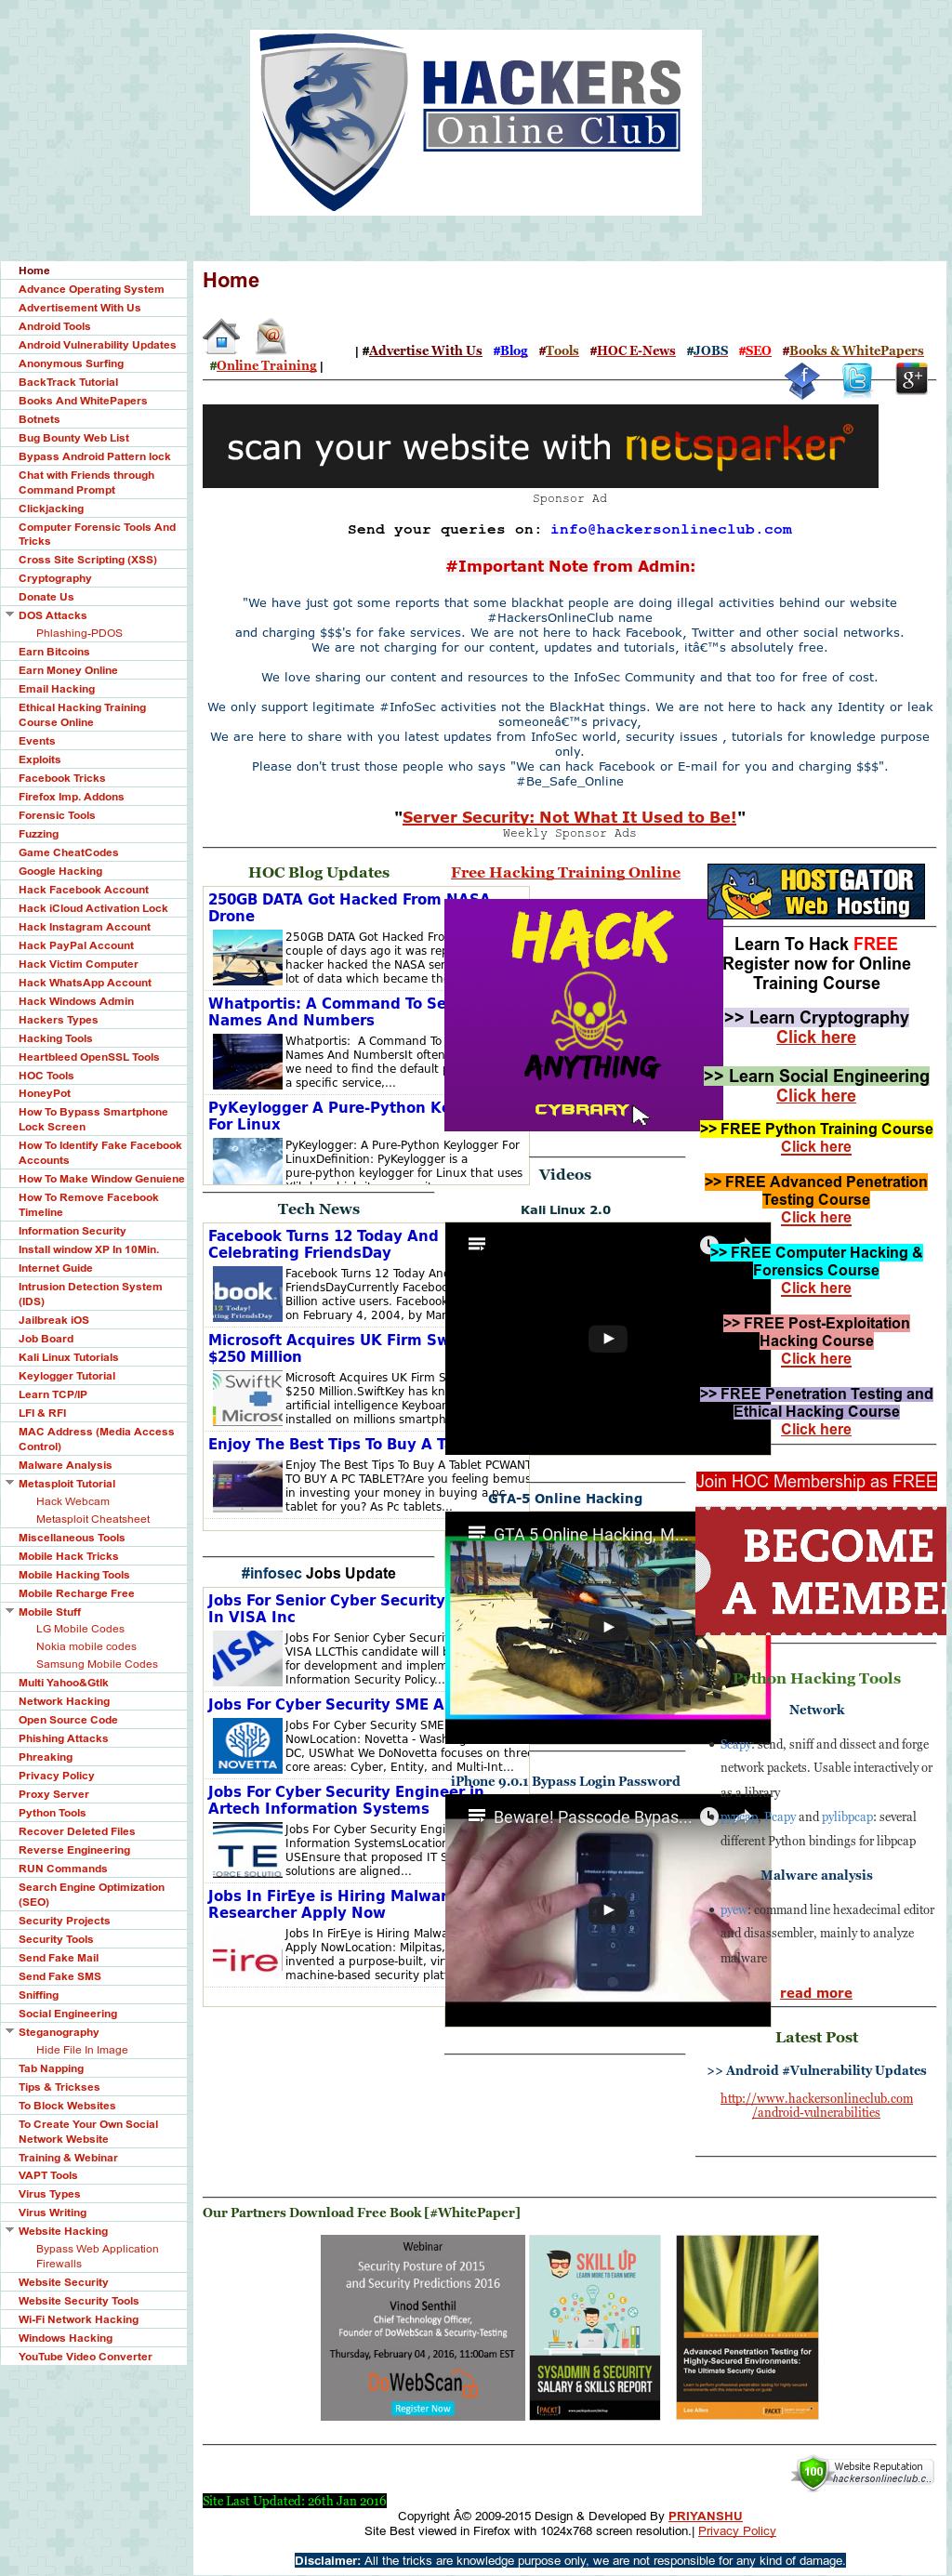 Owler Reports - Hackersonlineclub Blog Reverse Engineering Toolset